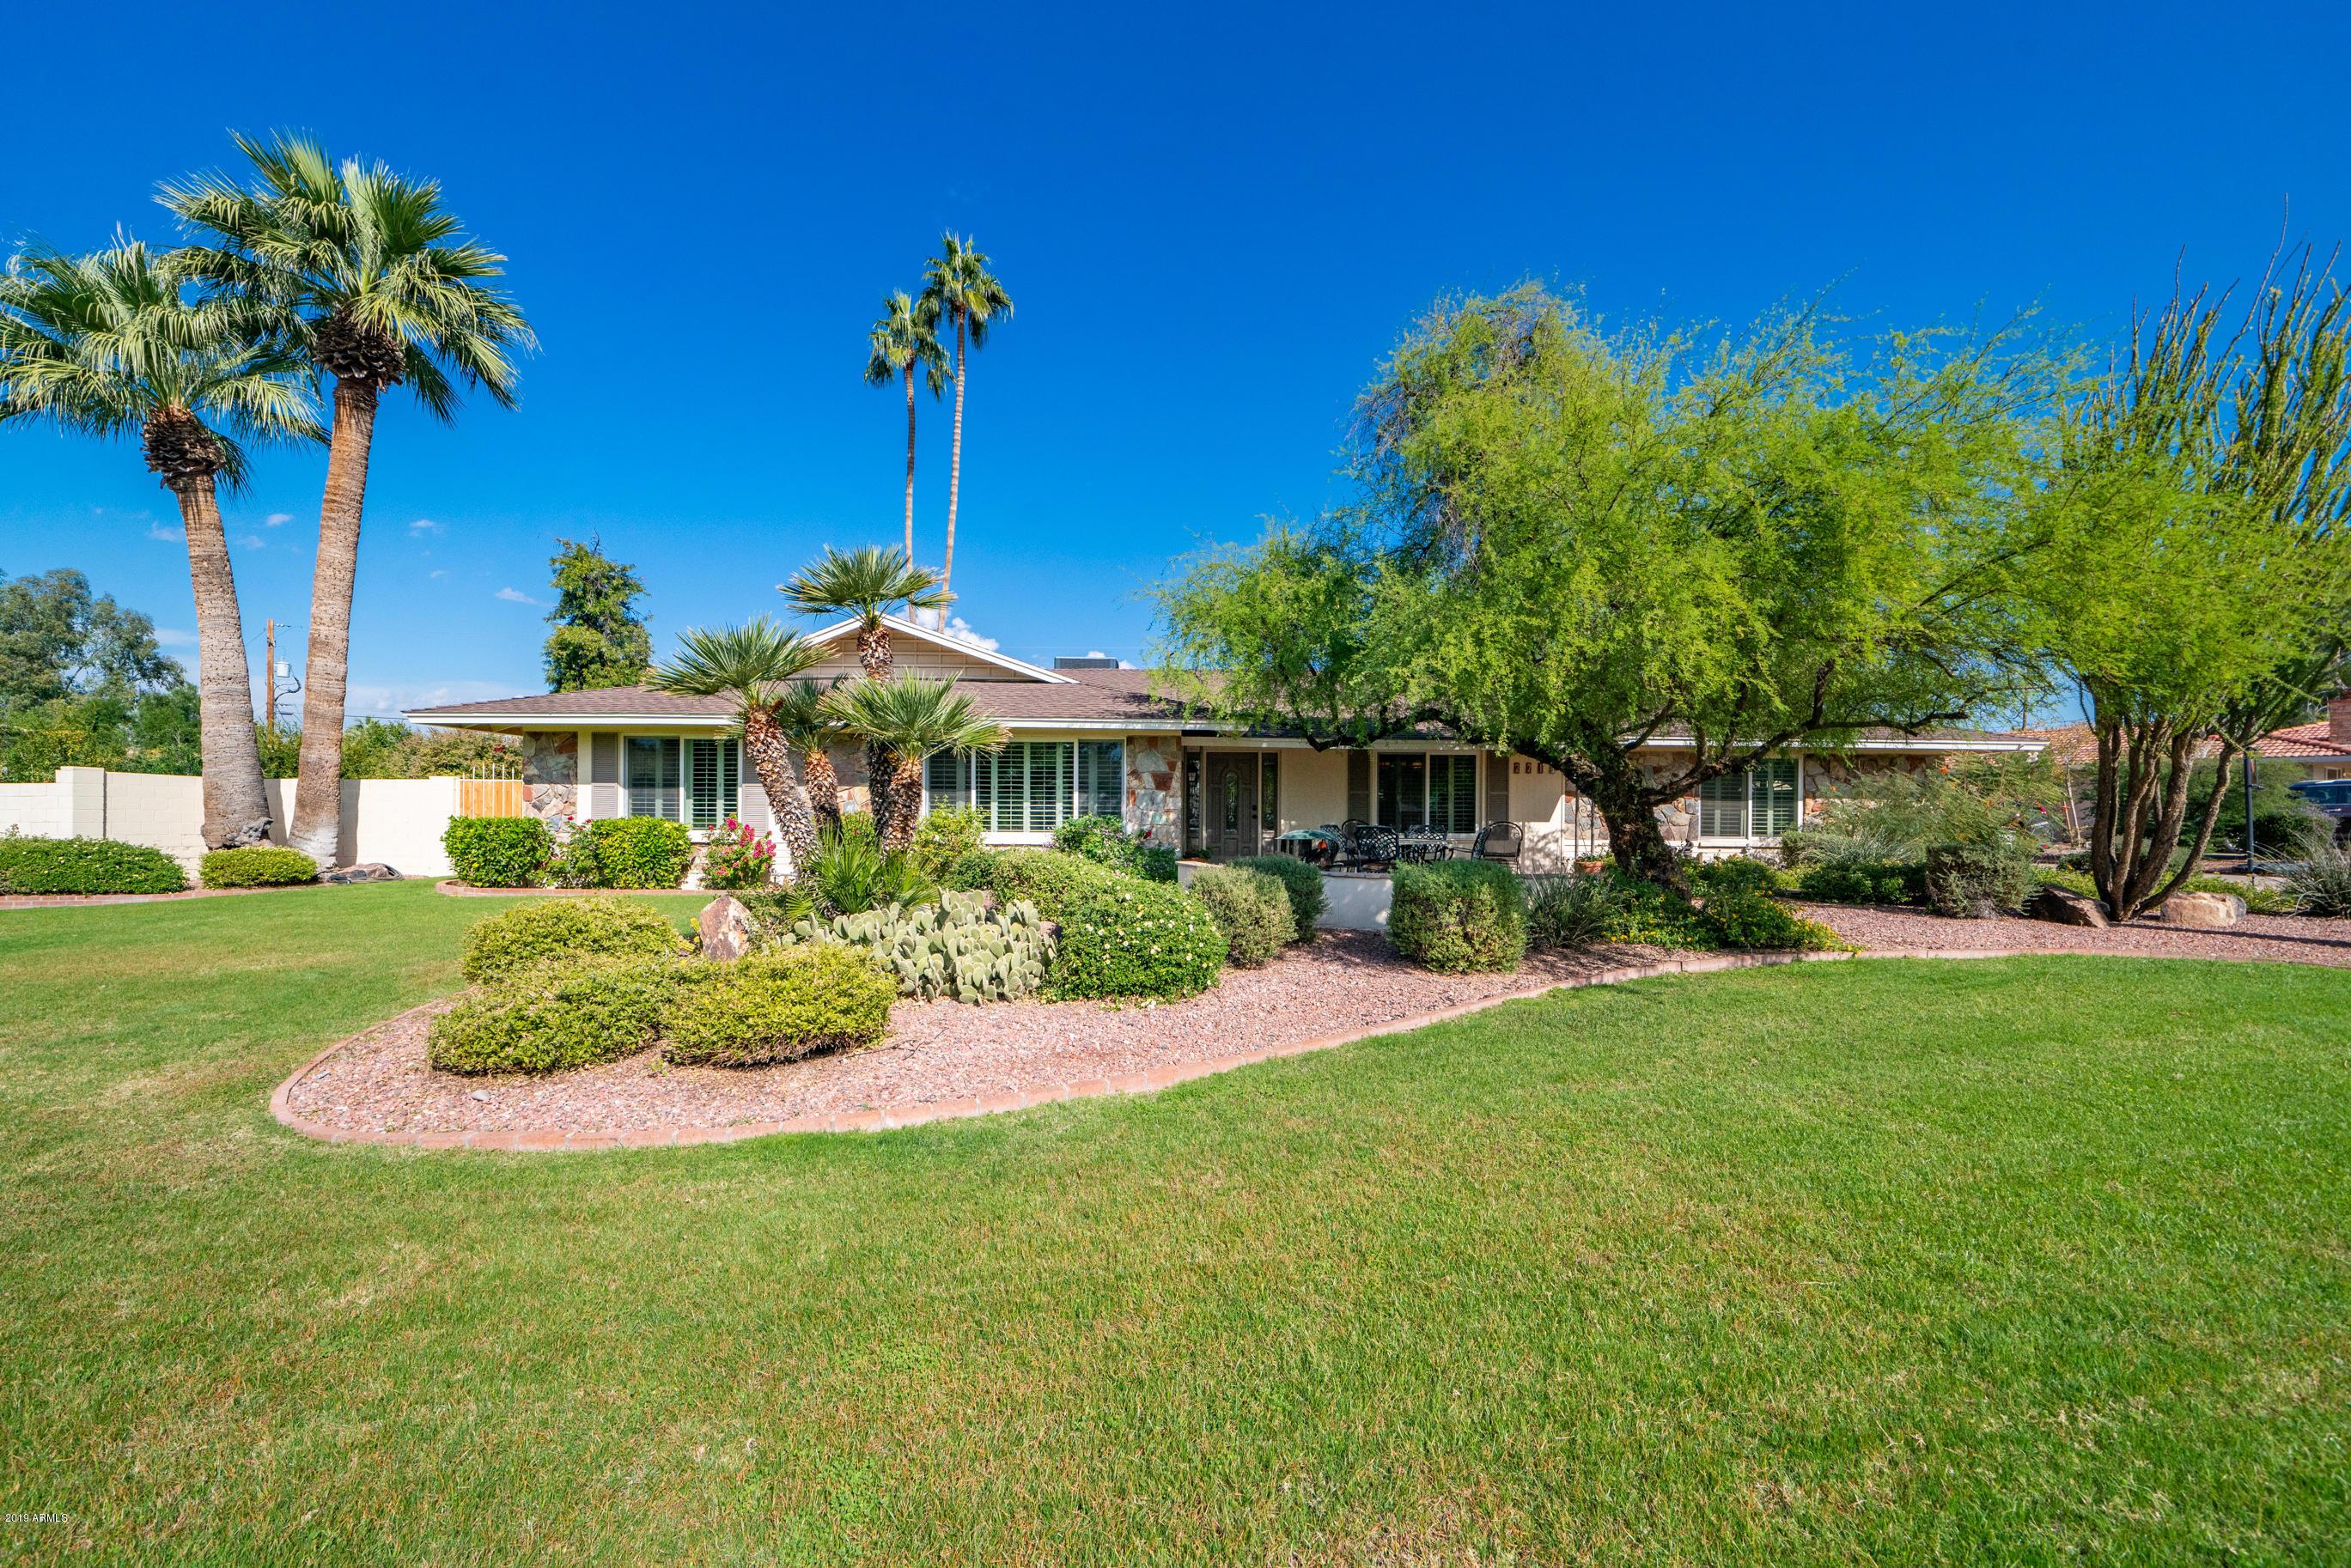 Photo of 2214 E SAN JUAN Avenue, Phoenix, AZ 85016